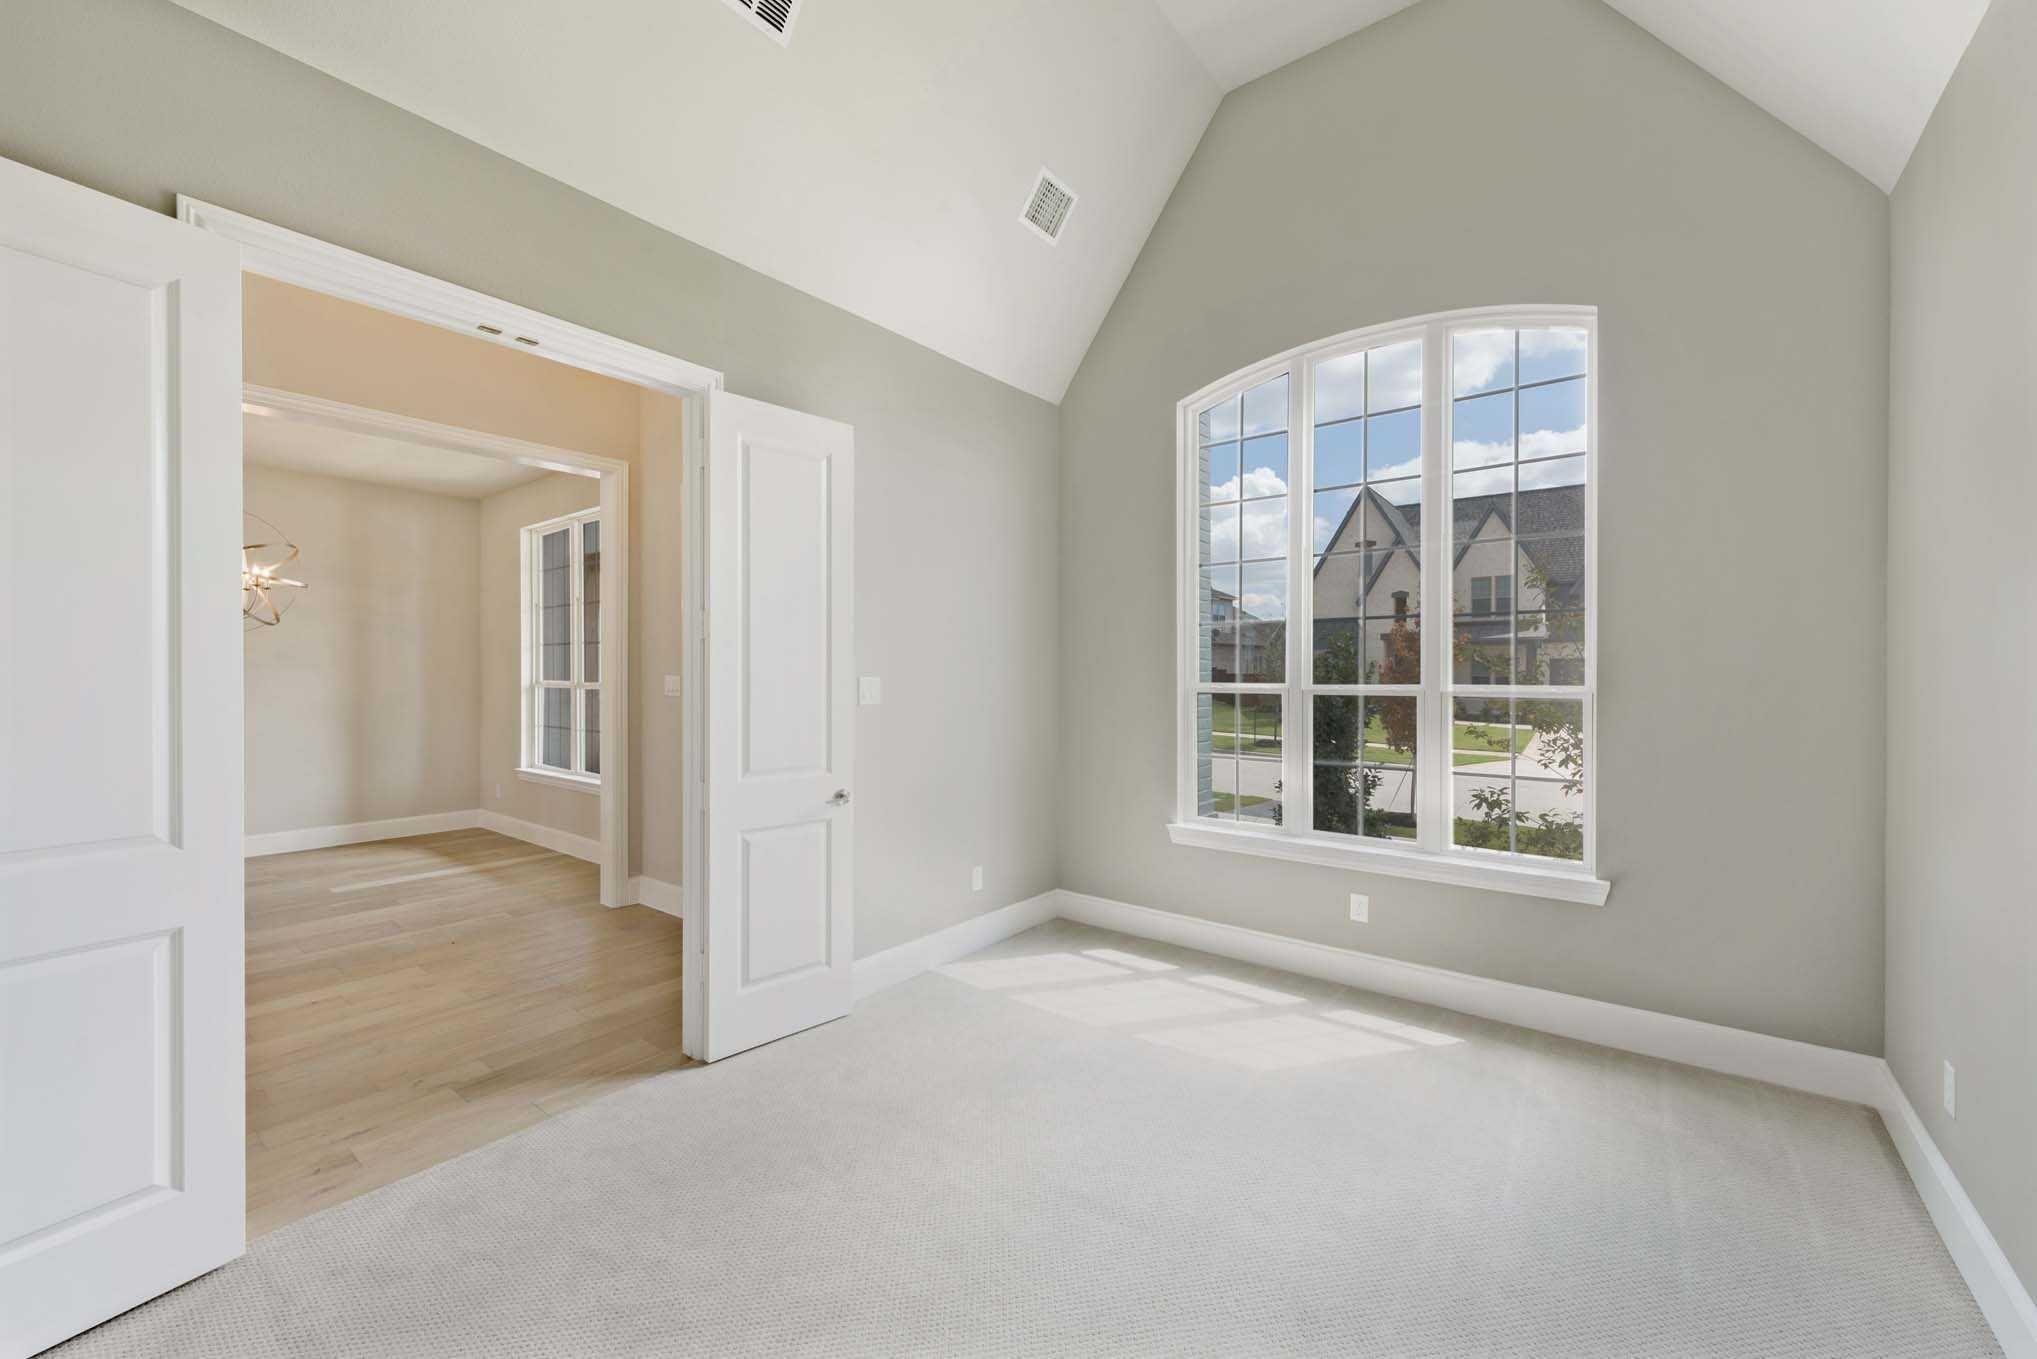 New Home for Sale 15272 Viburnum Road, Frisco, TX 75035